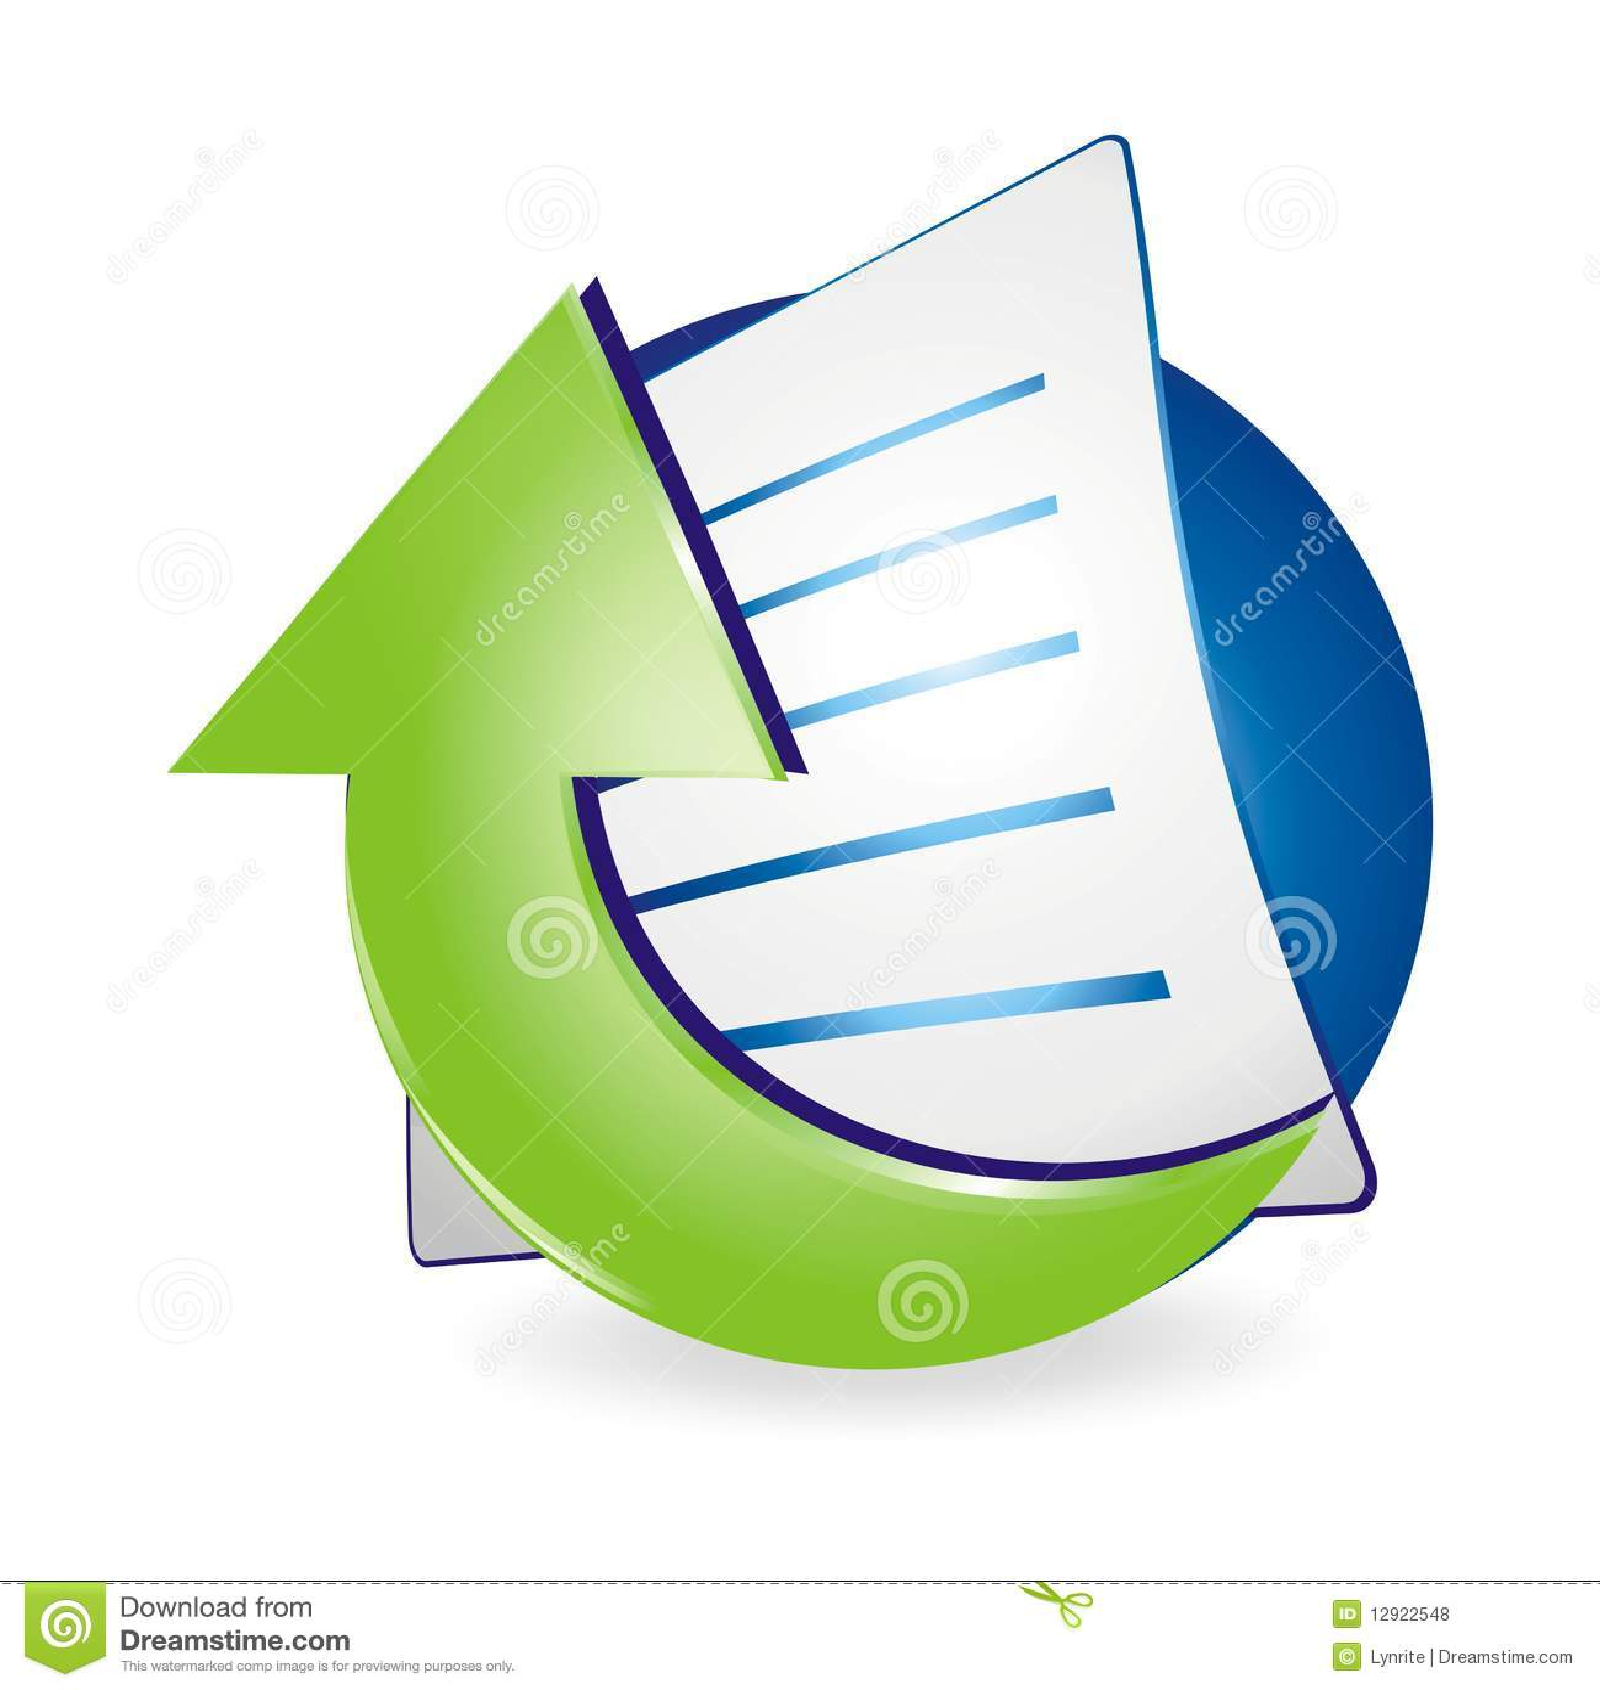 clipart document icon - photo #40